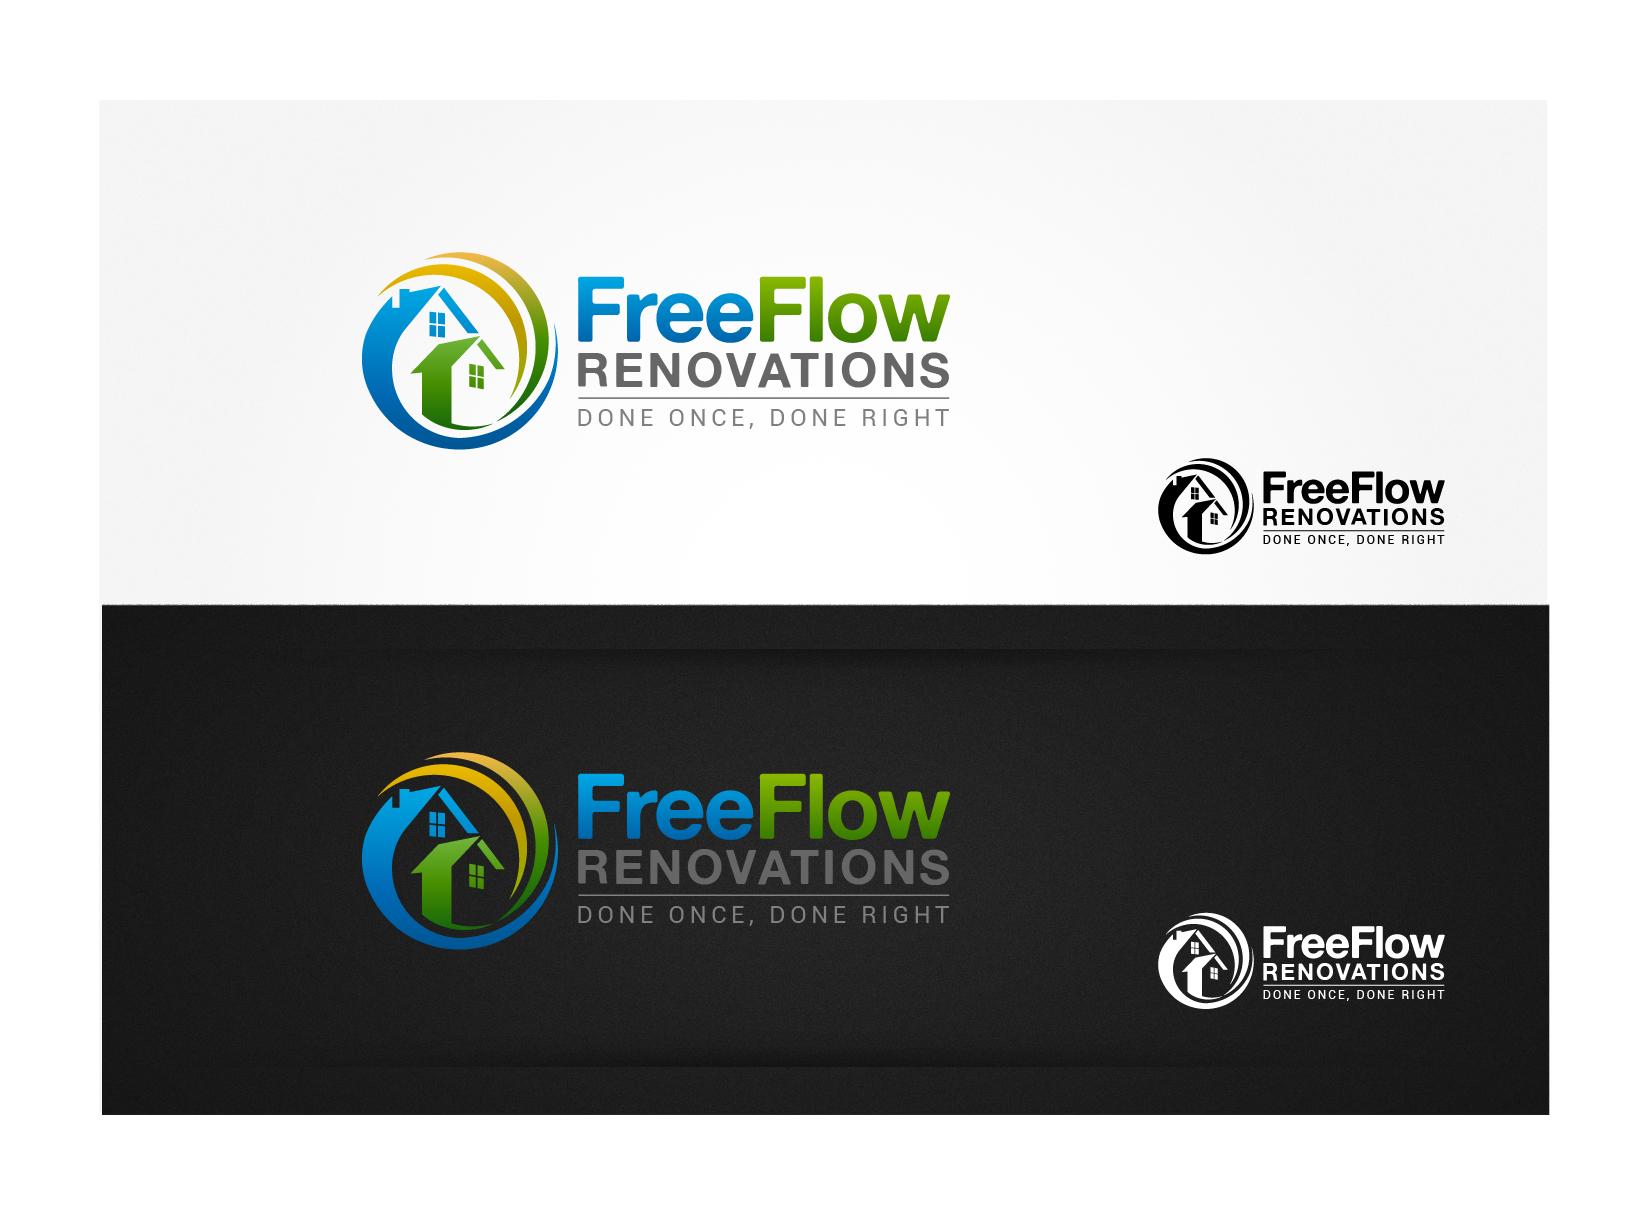 Free Flow Renovations needs a new logo